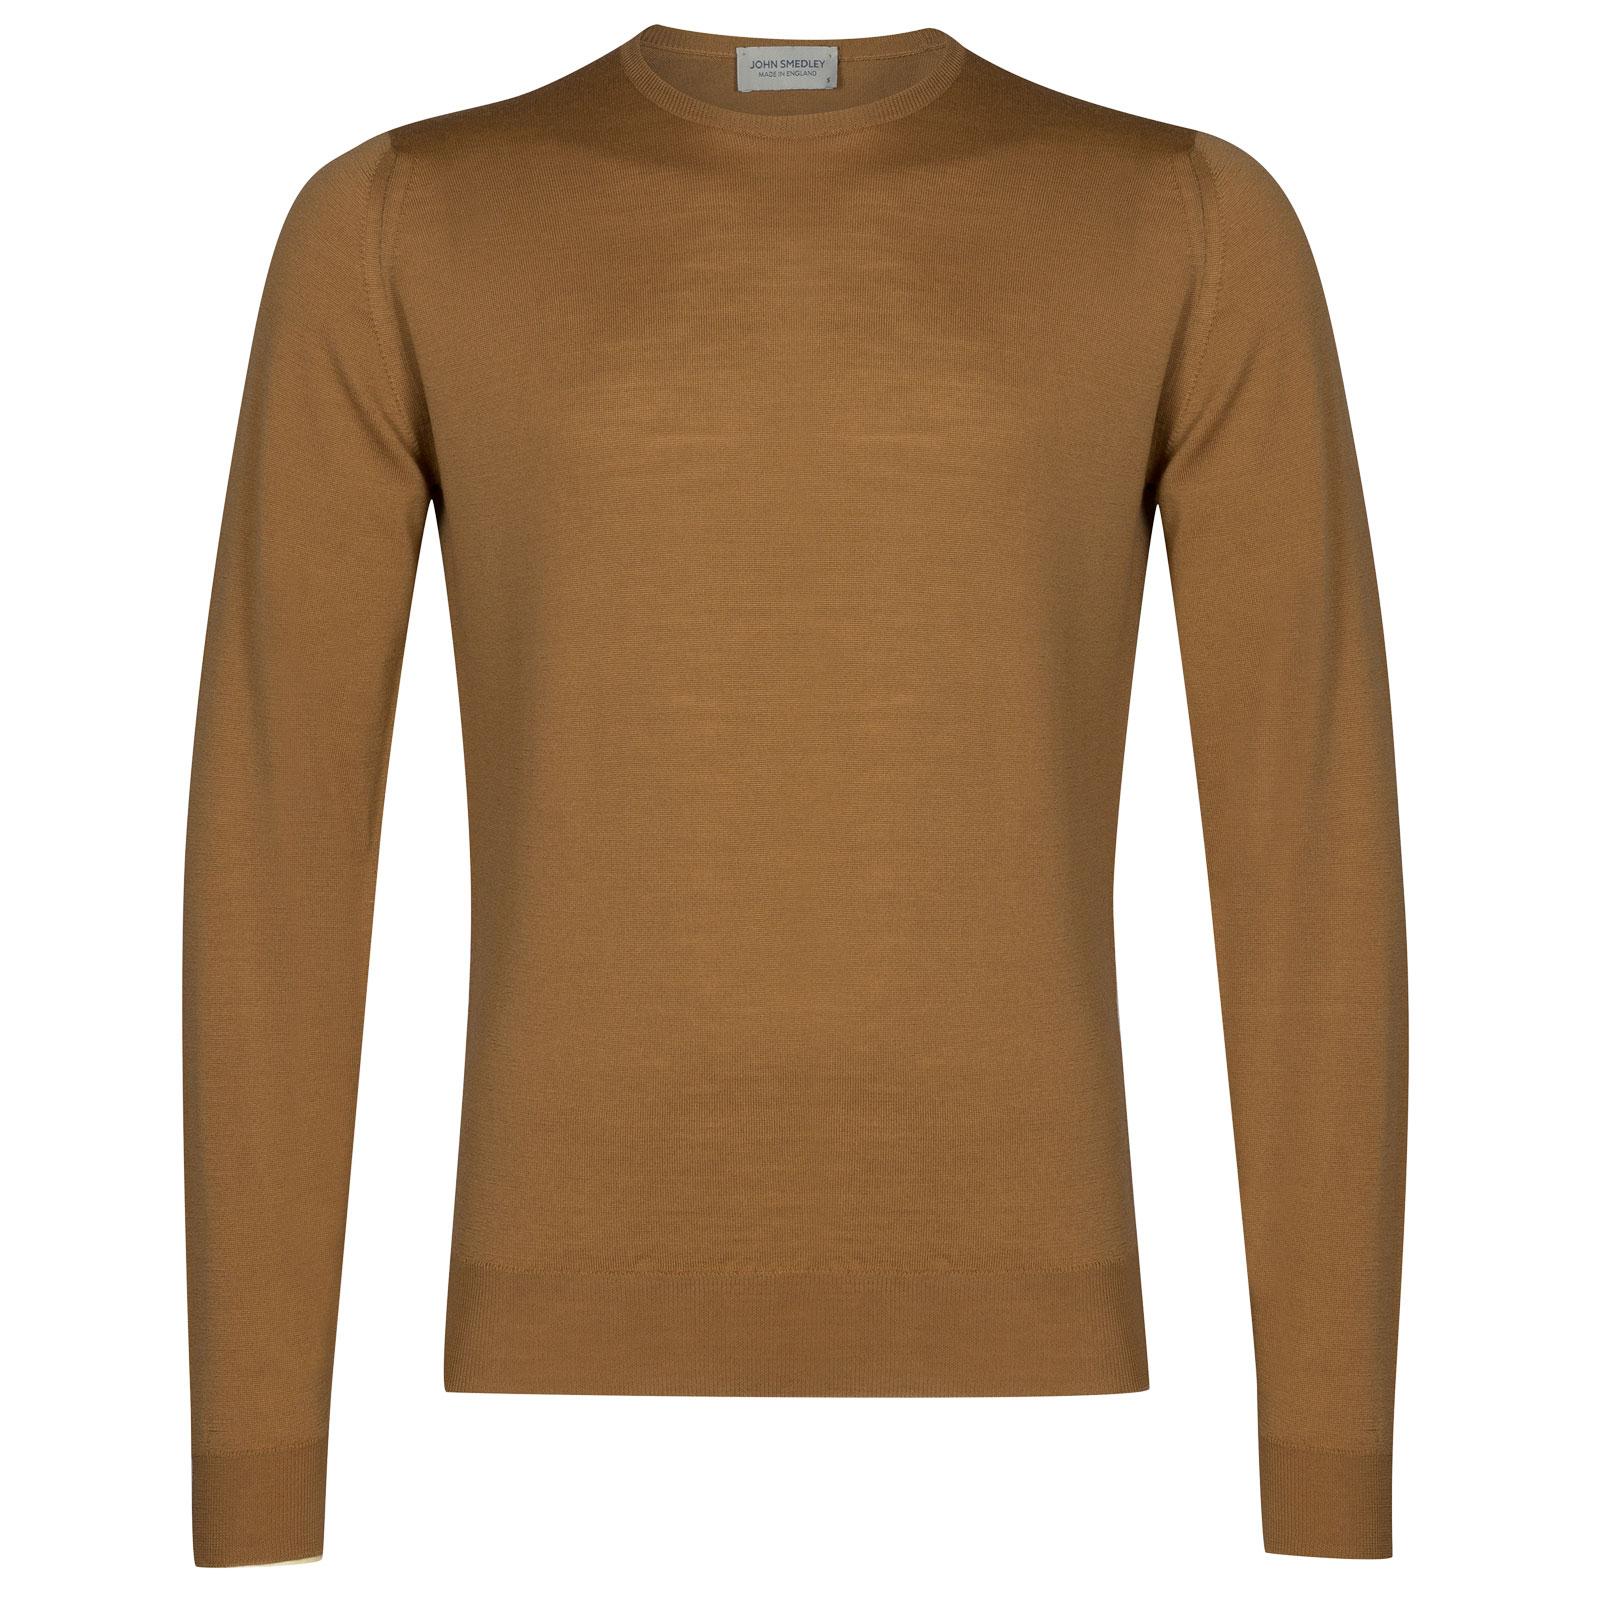 John Smedley lundy Merino Wool Pullover in Camel-XXL